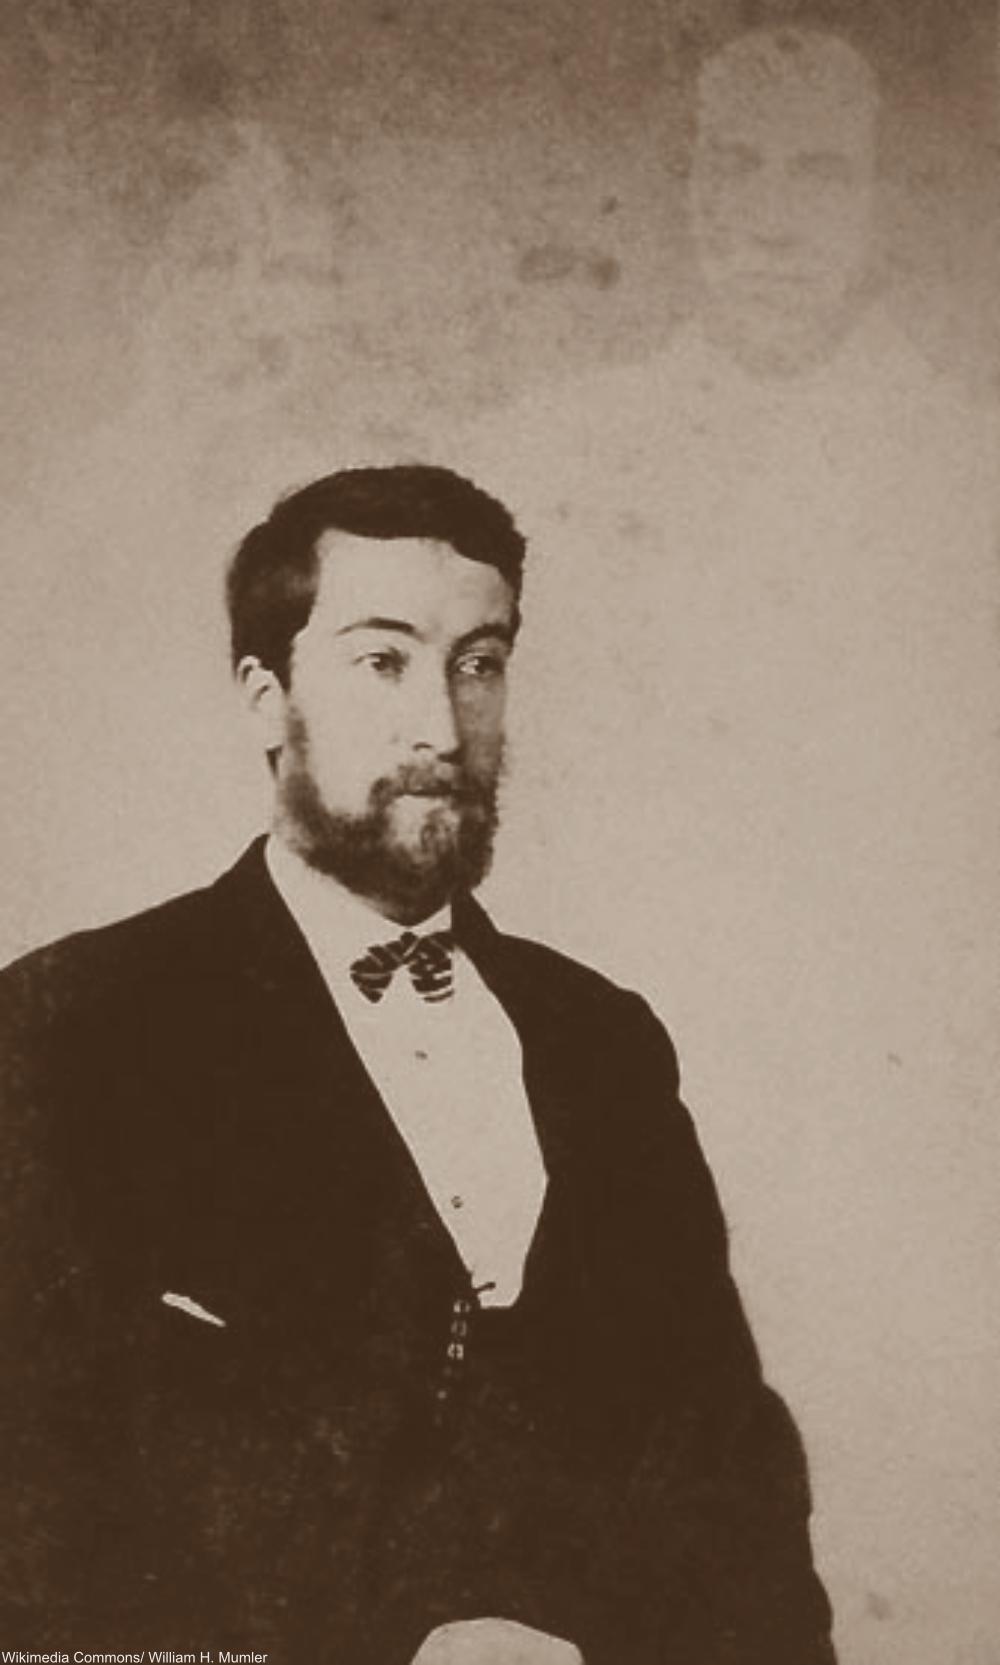 Spirit photography by known fraudster William Mumler, 1870.